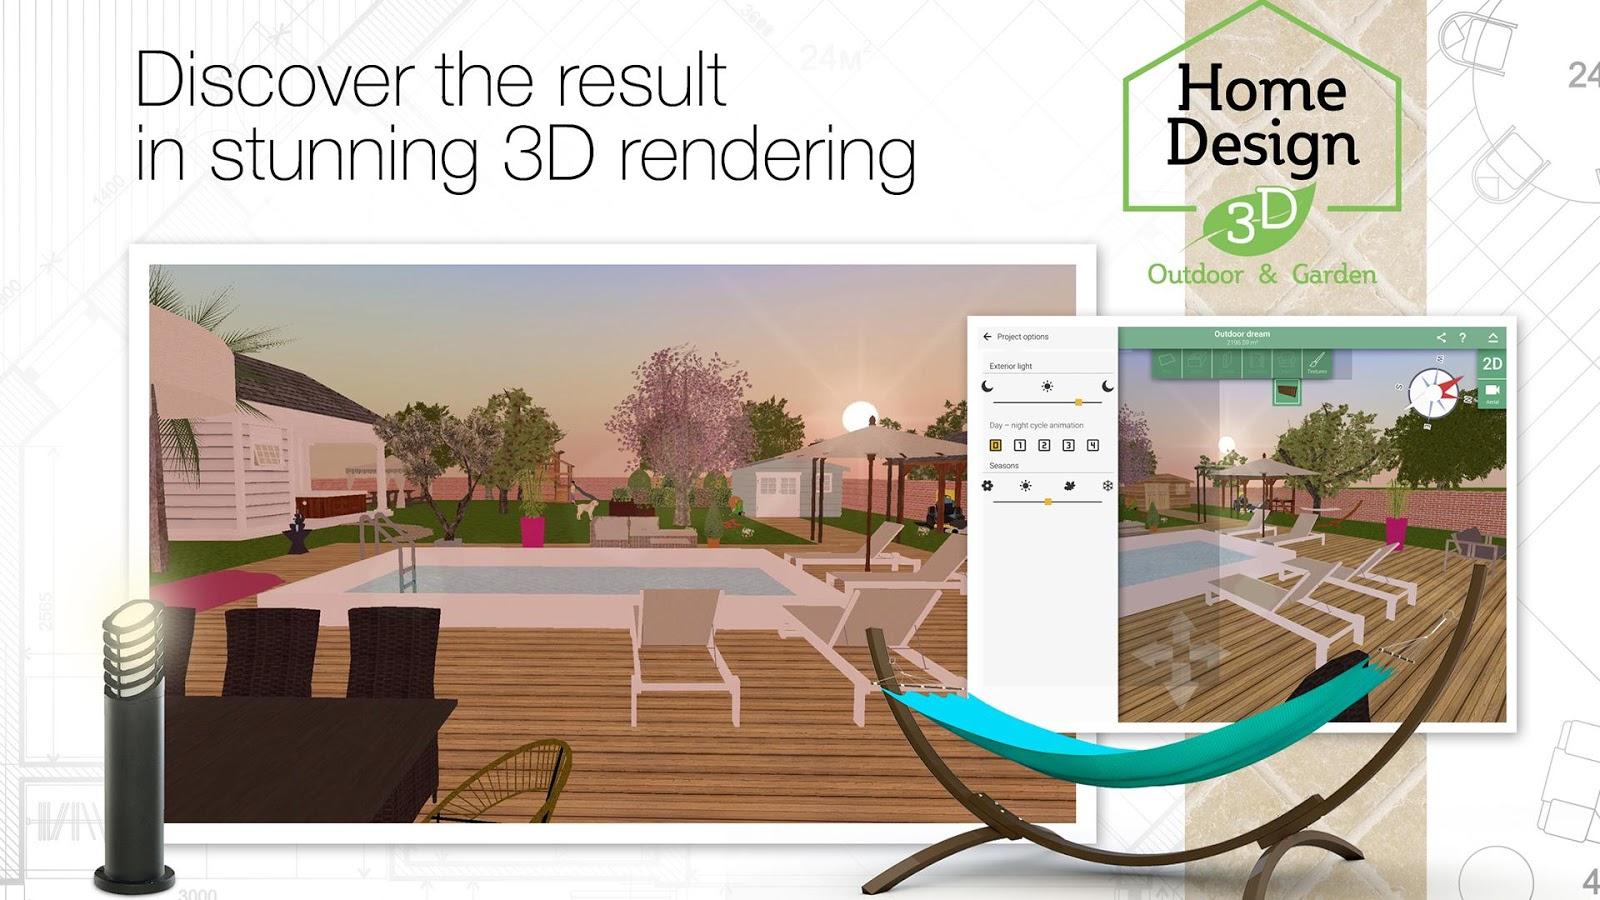 home design 3d outdoor garden 4 2 4 apk obb data file download